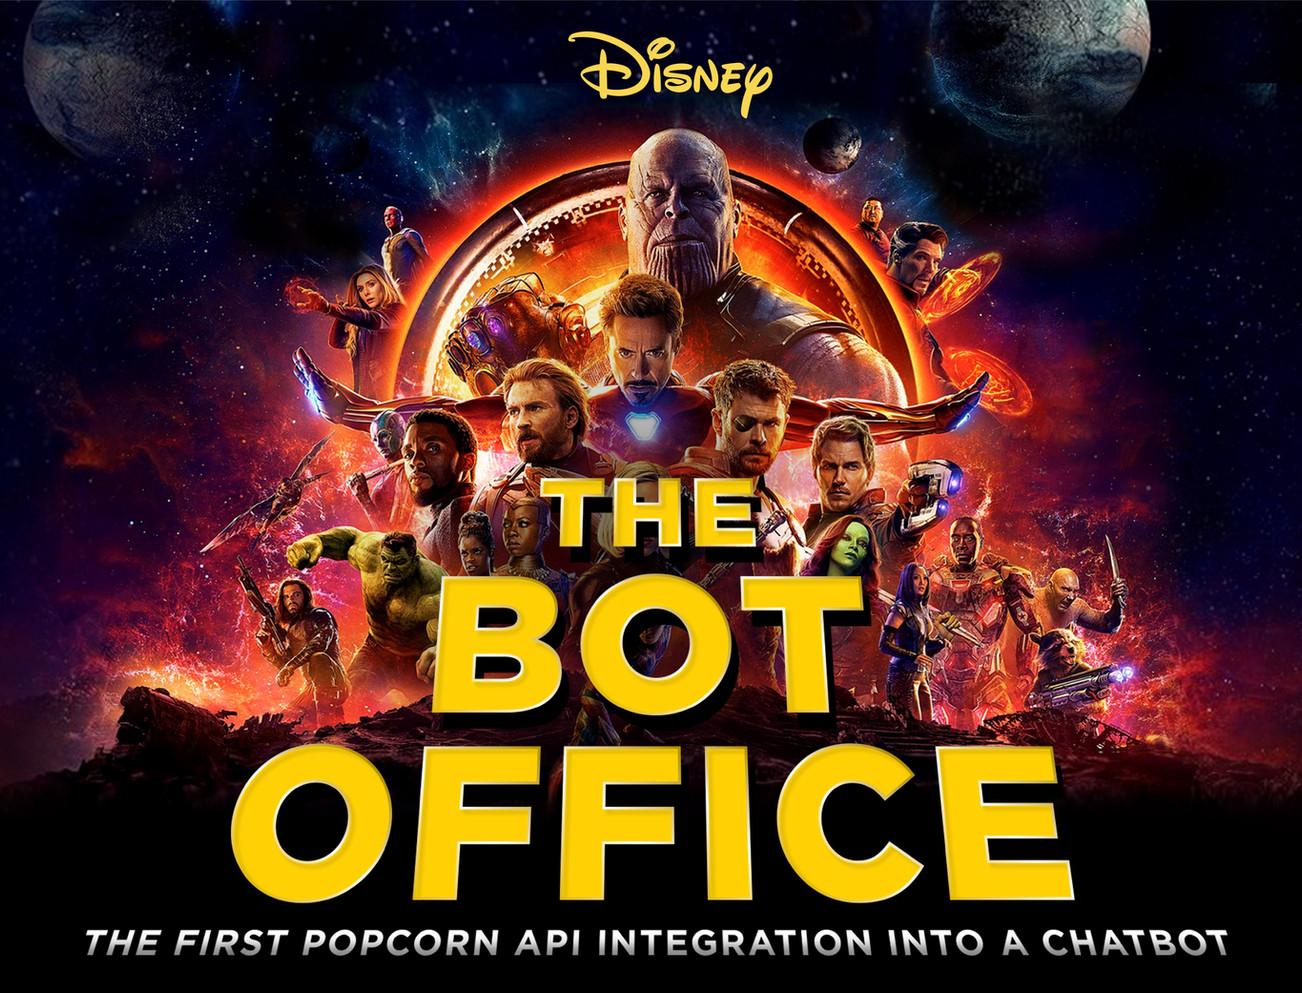 Disney - The Bot Office